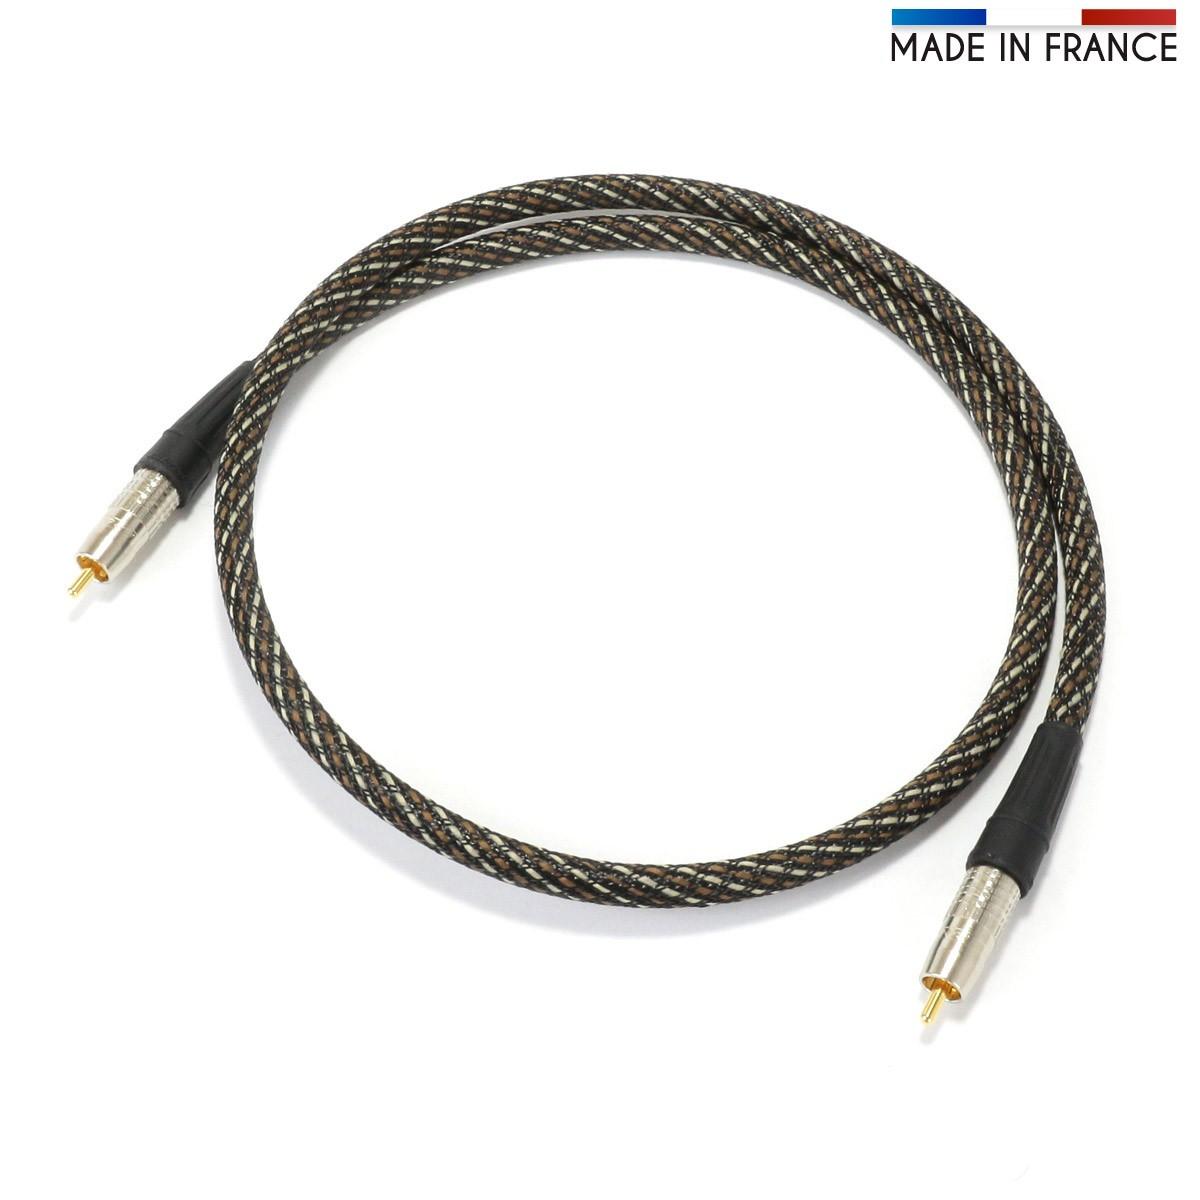 AUDIOPHONICS CANARE Digital Coaxial Cable 75ohm RCA-RCA 3m